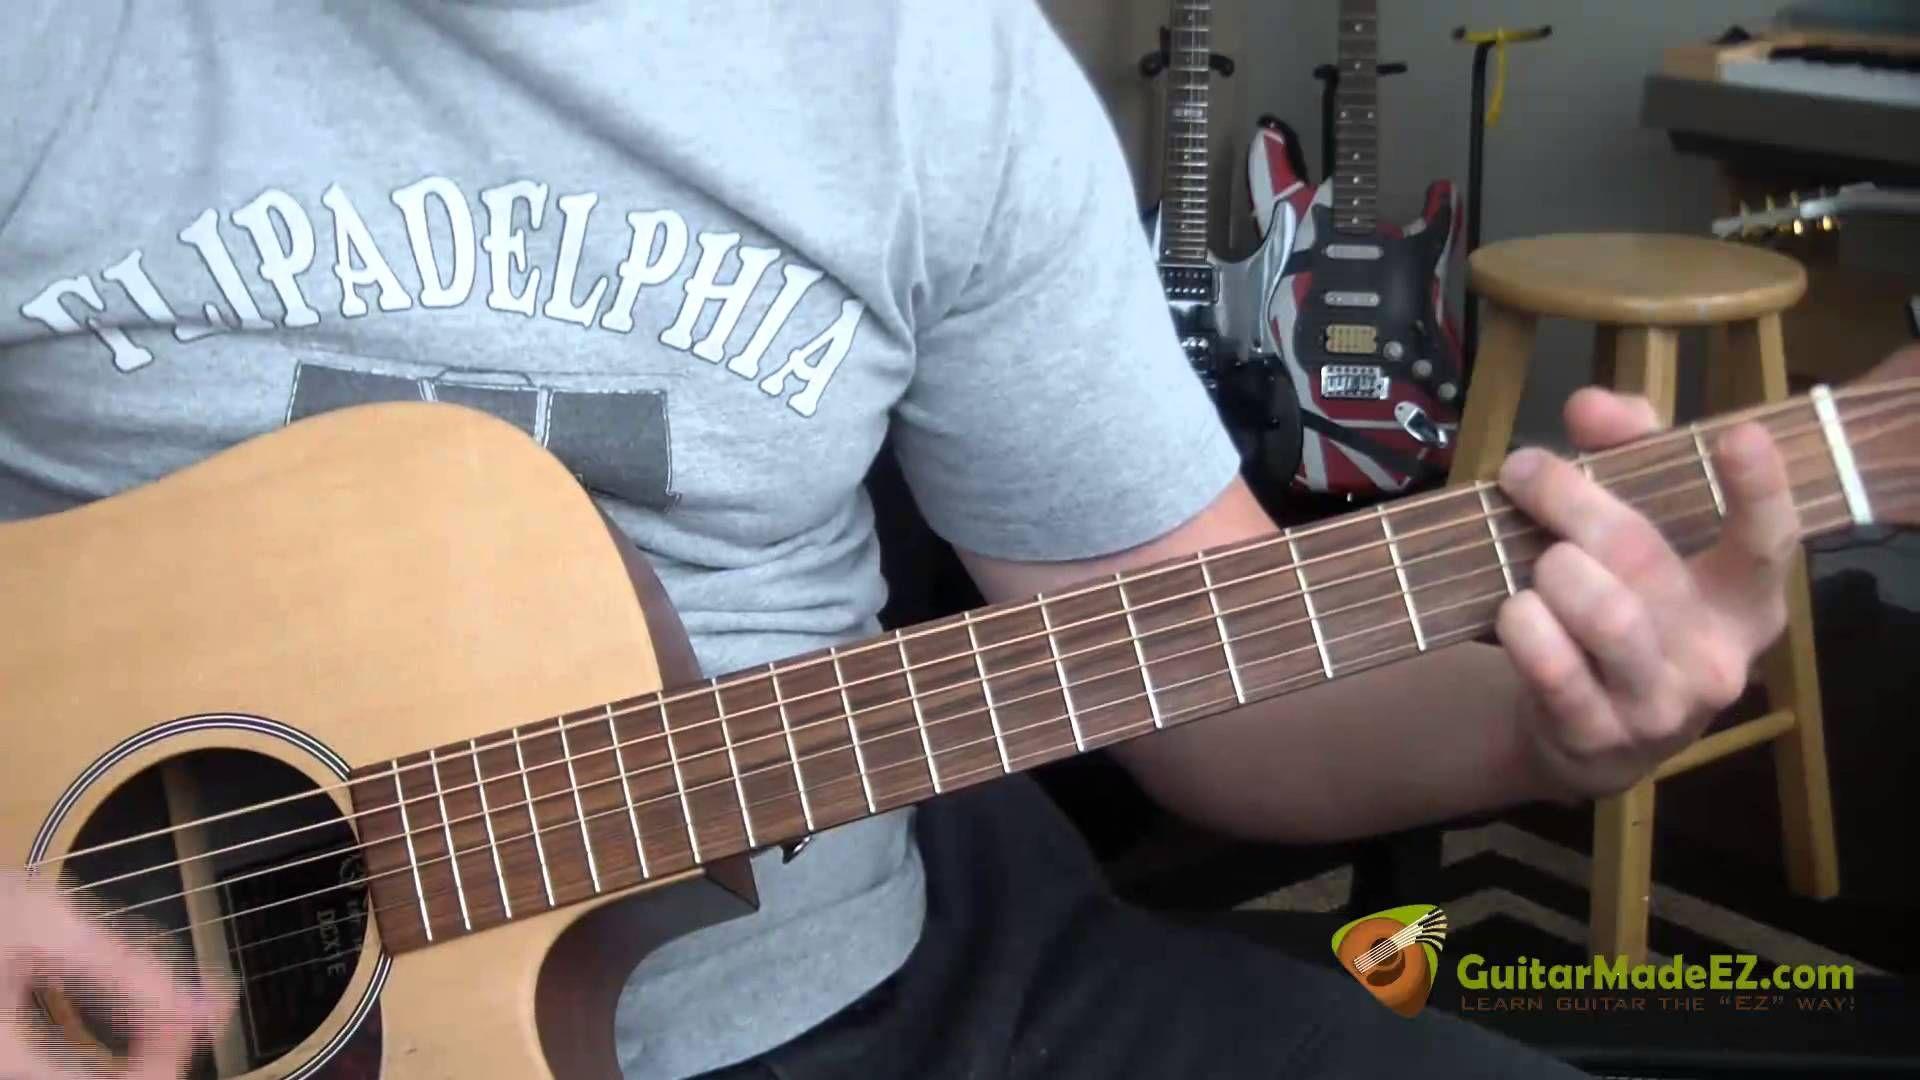 Bob Dylan It Aint Me Babe Guitar Lesson Guitar Lessons